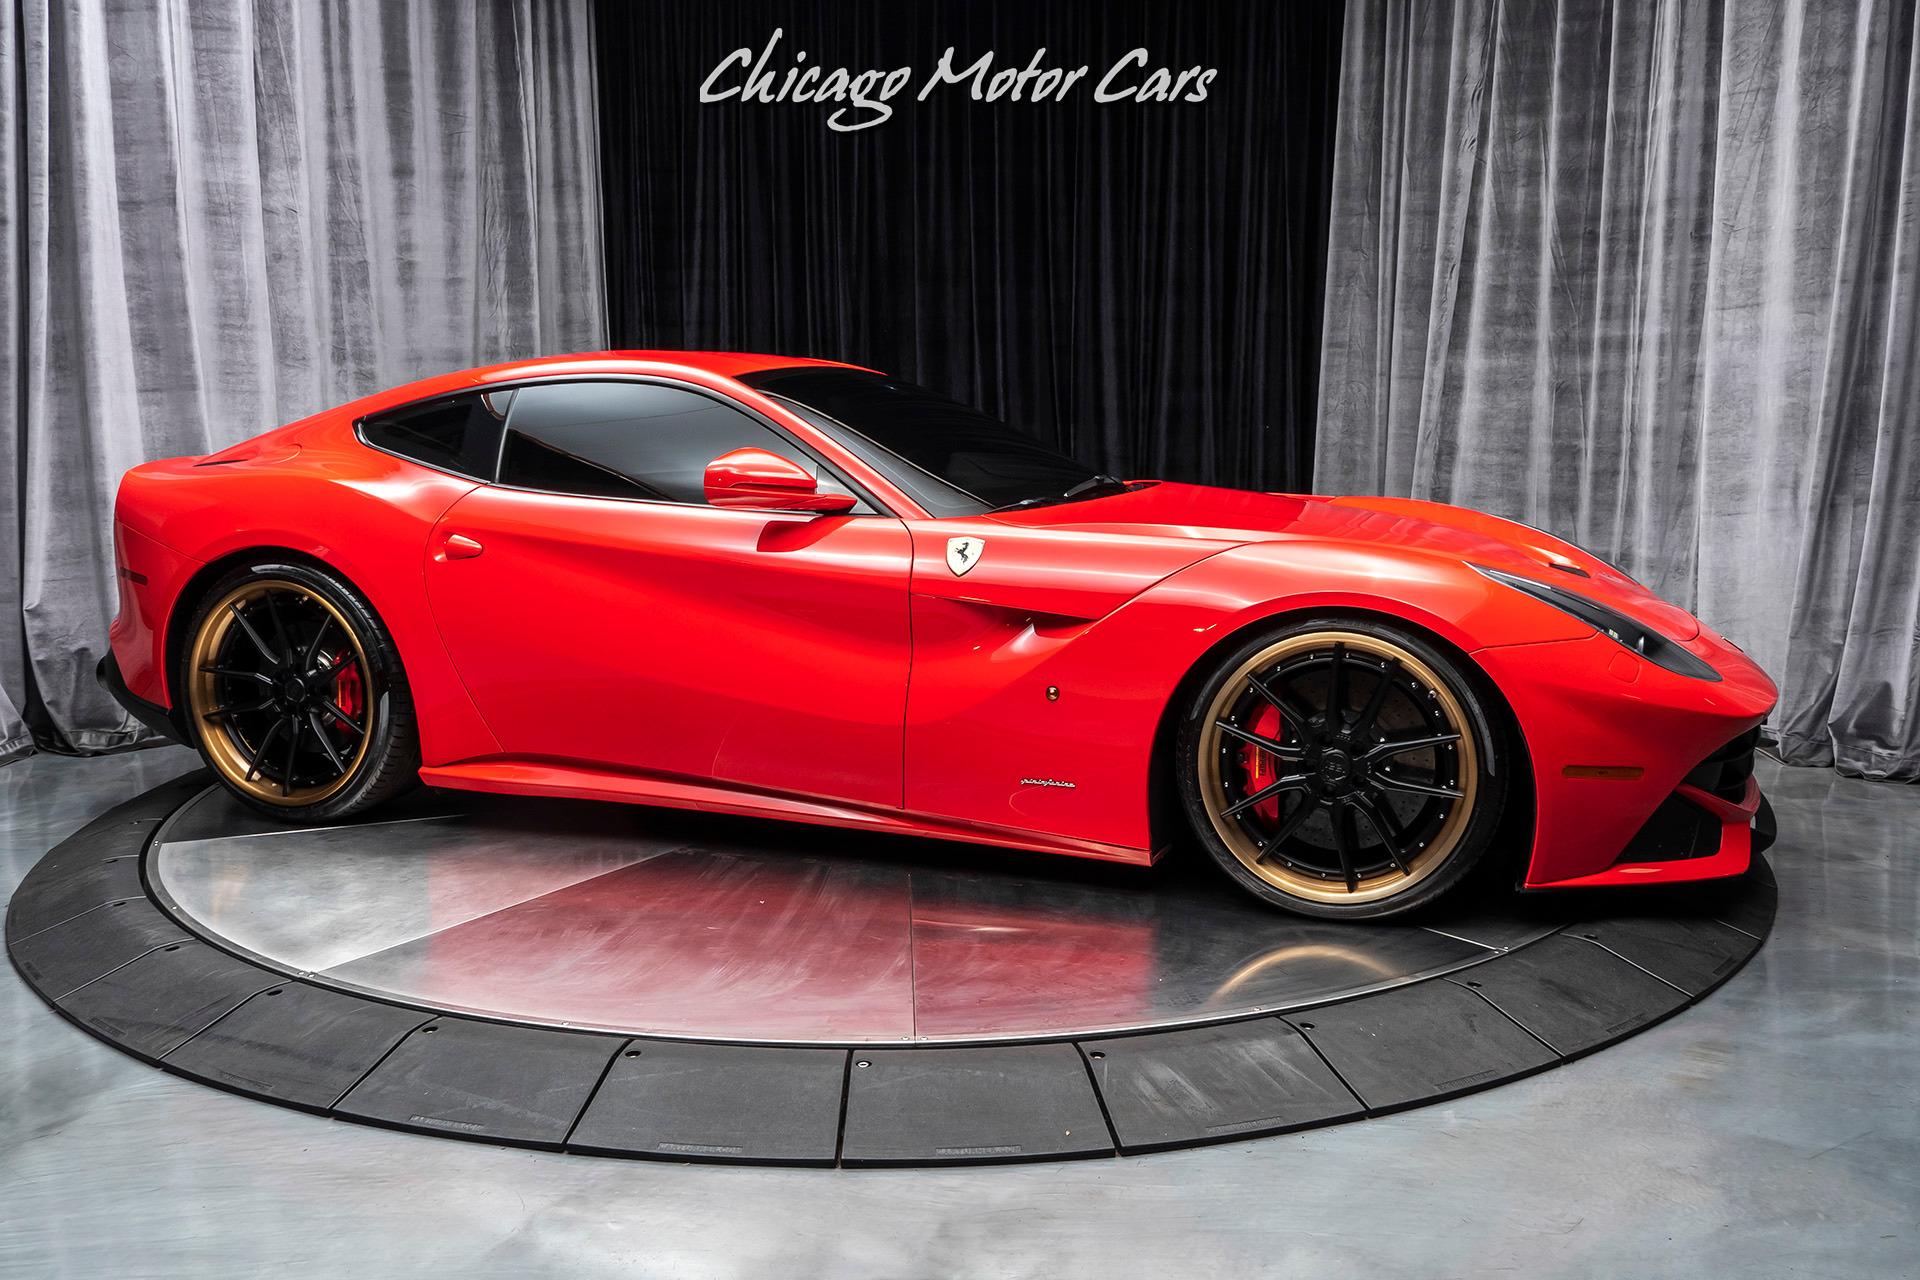 Used-2014-Ferrari-F12-Berlinetta-Coupe-CARBON-FIBER-DRIVING-ZONE-wLEDs